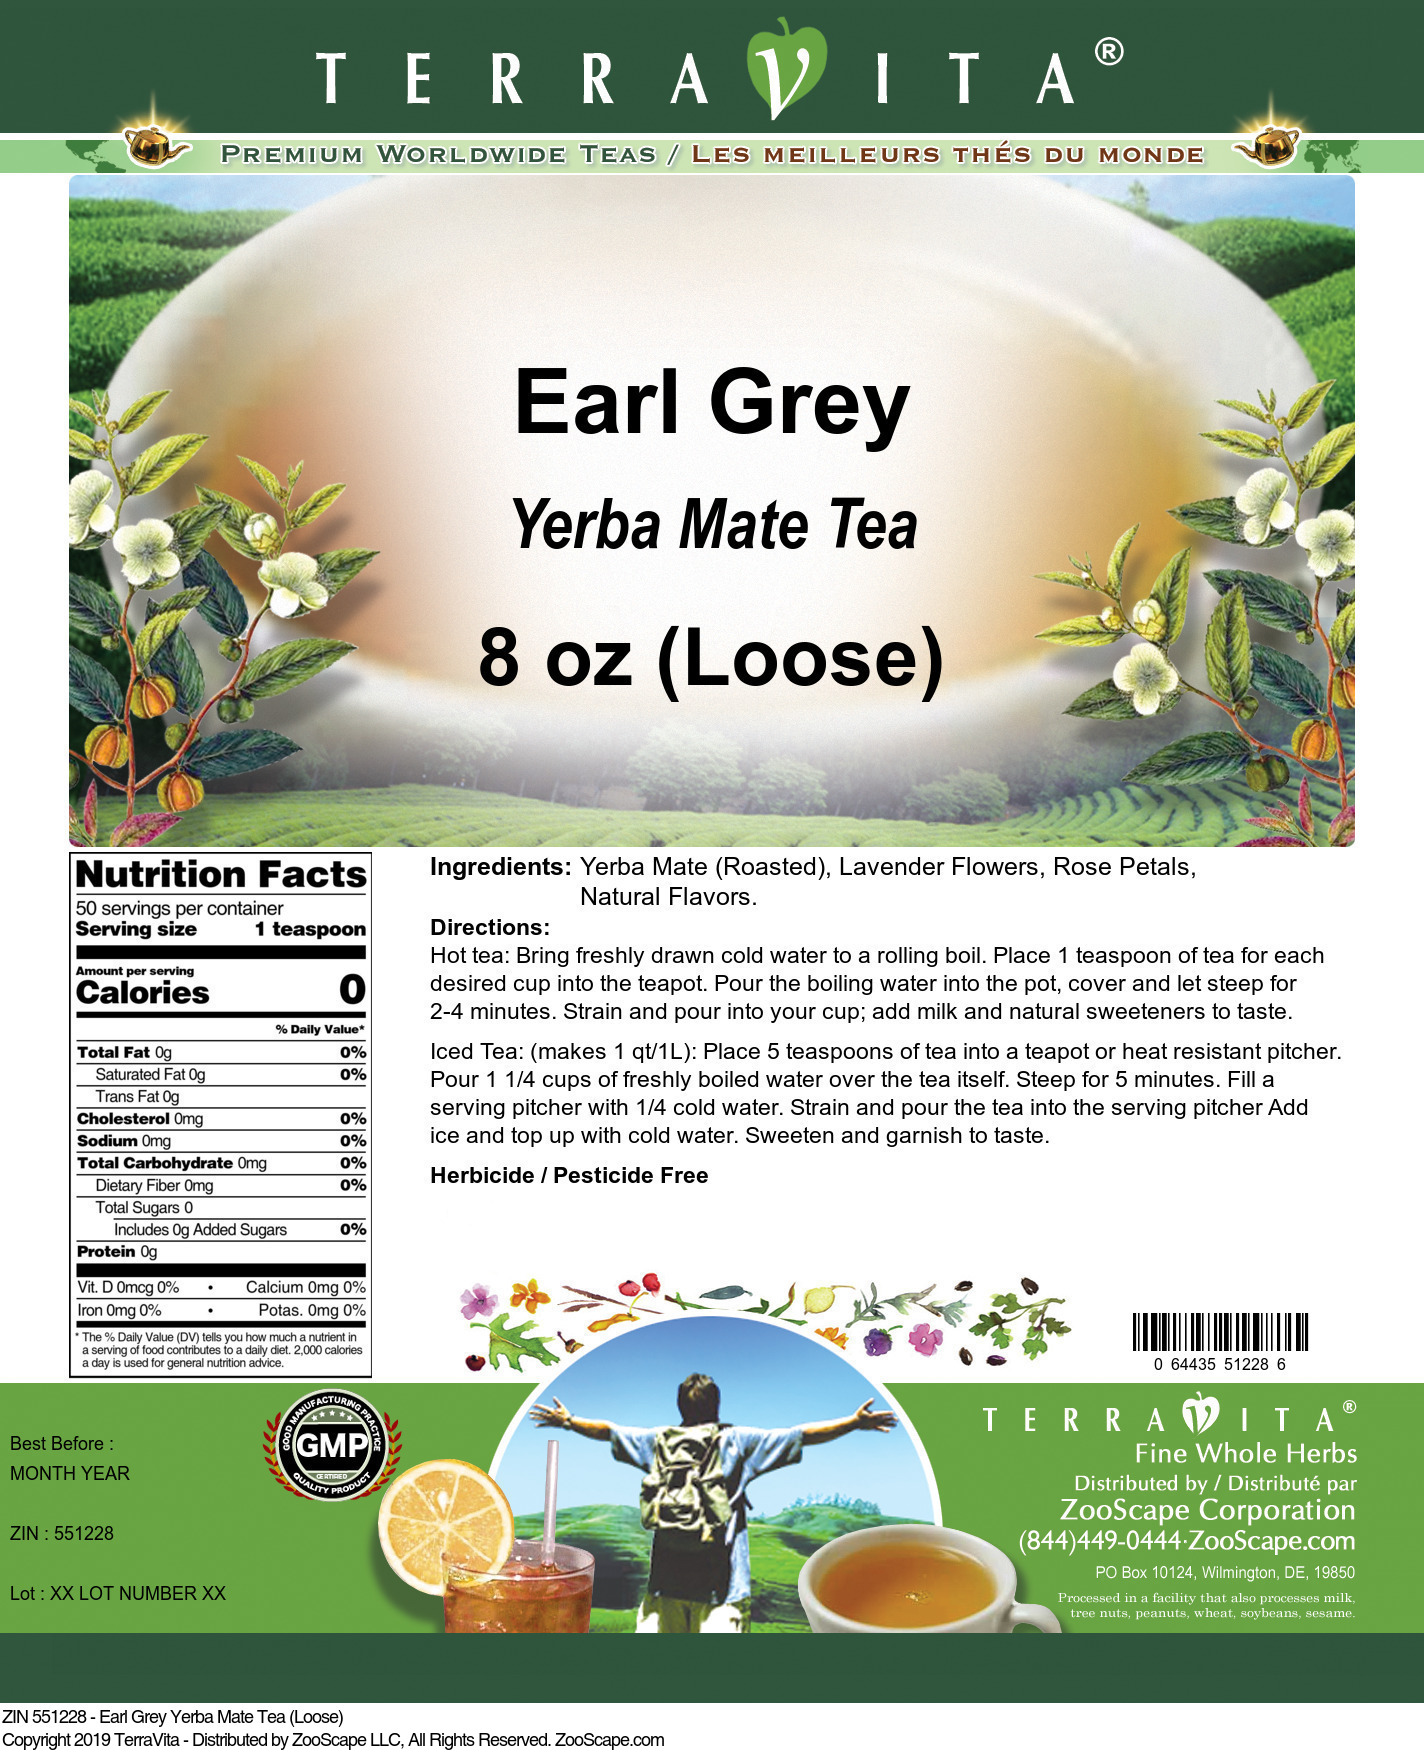 Earl Grey Yerba Mate Tea (Loose)